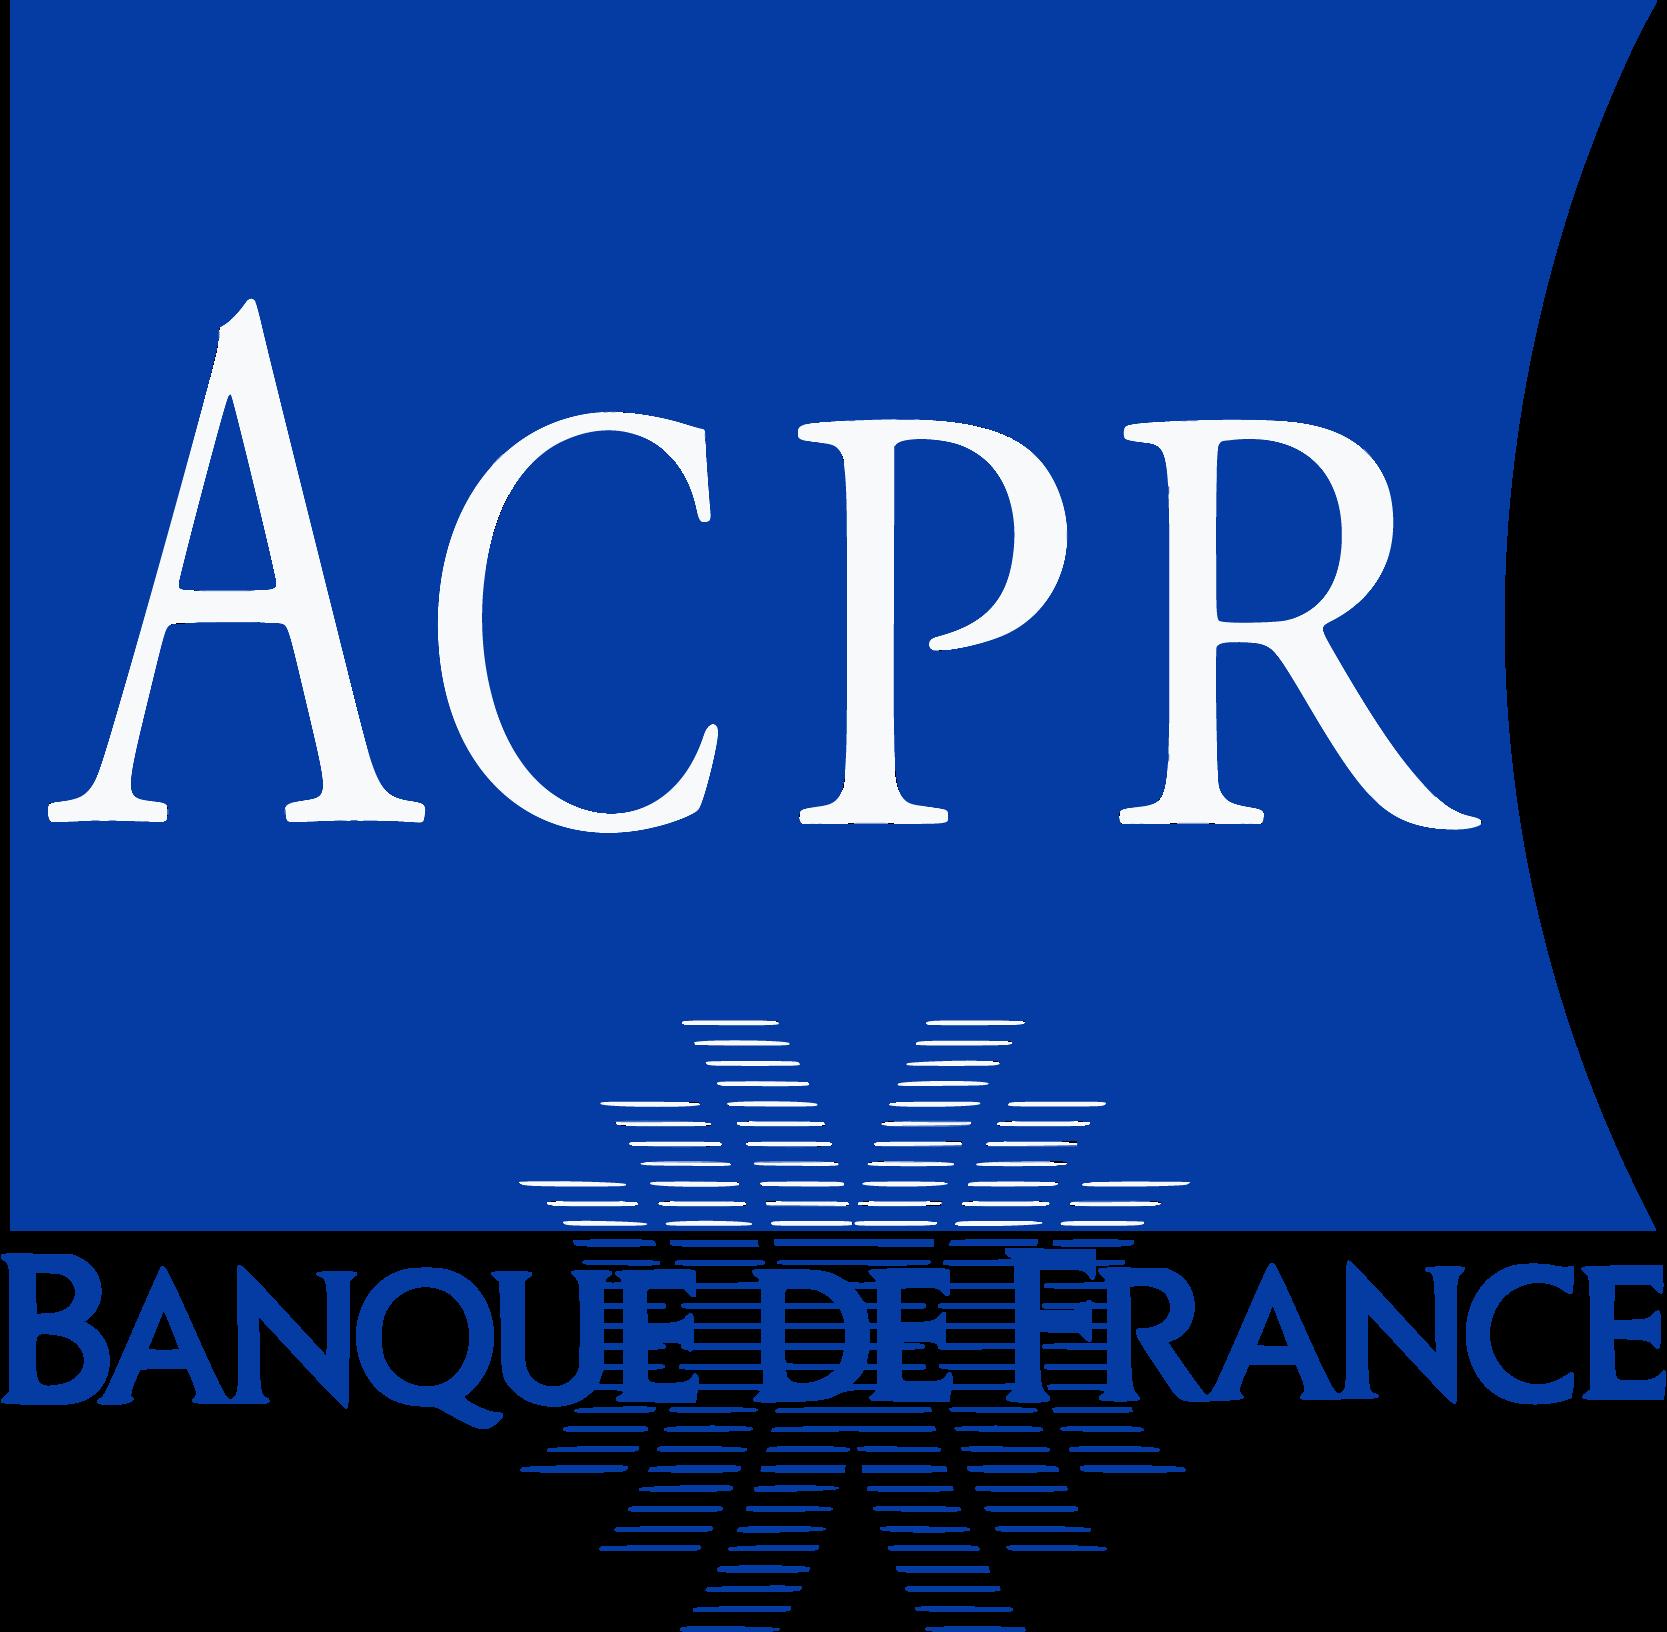 ACPR Banque de France